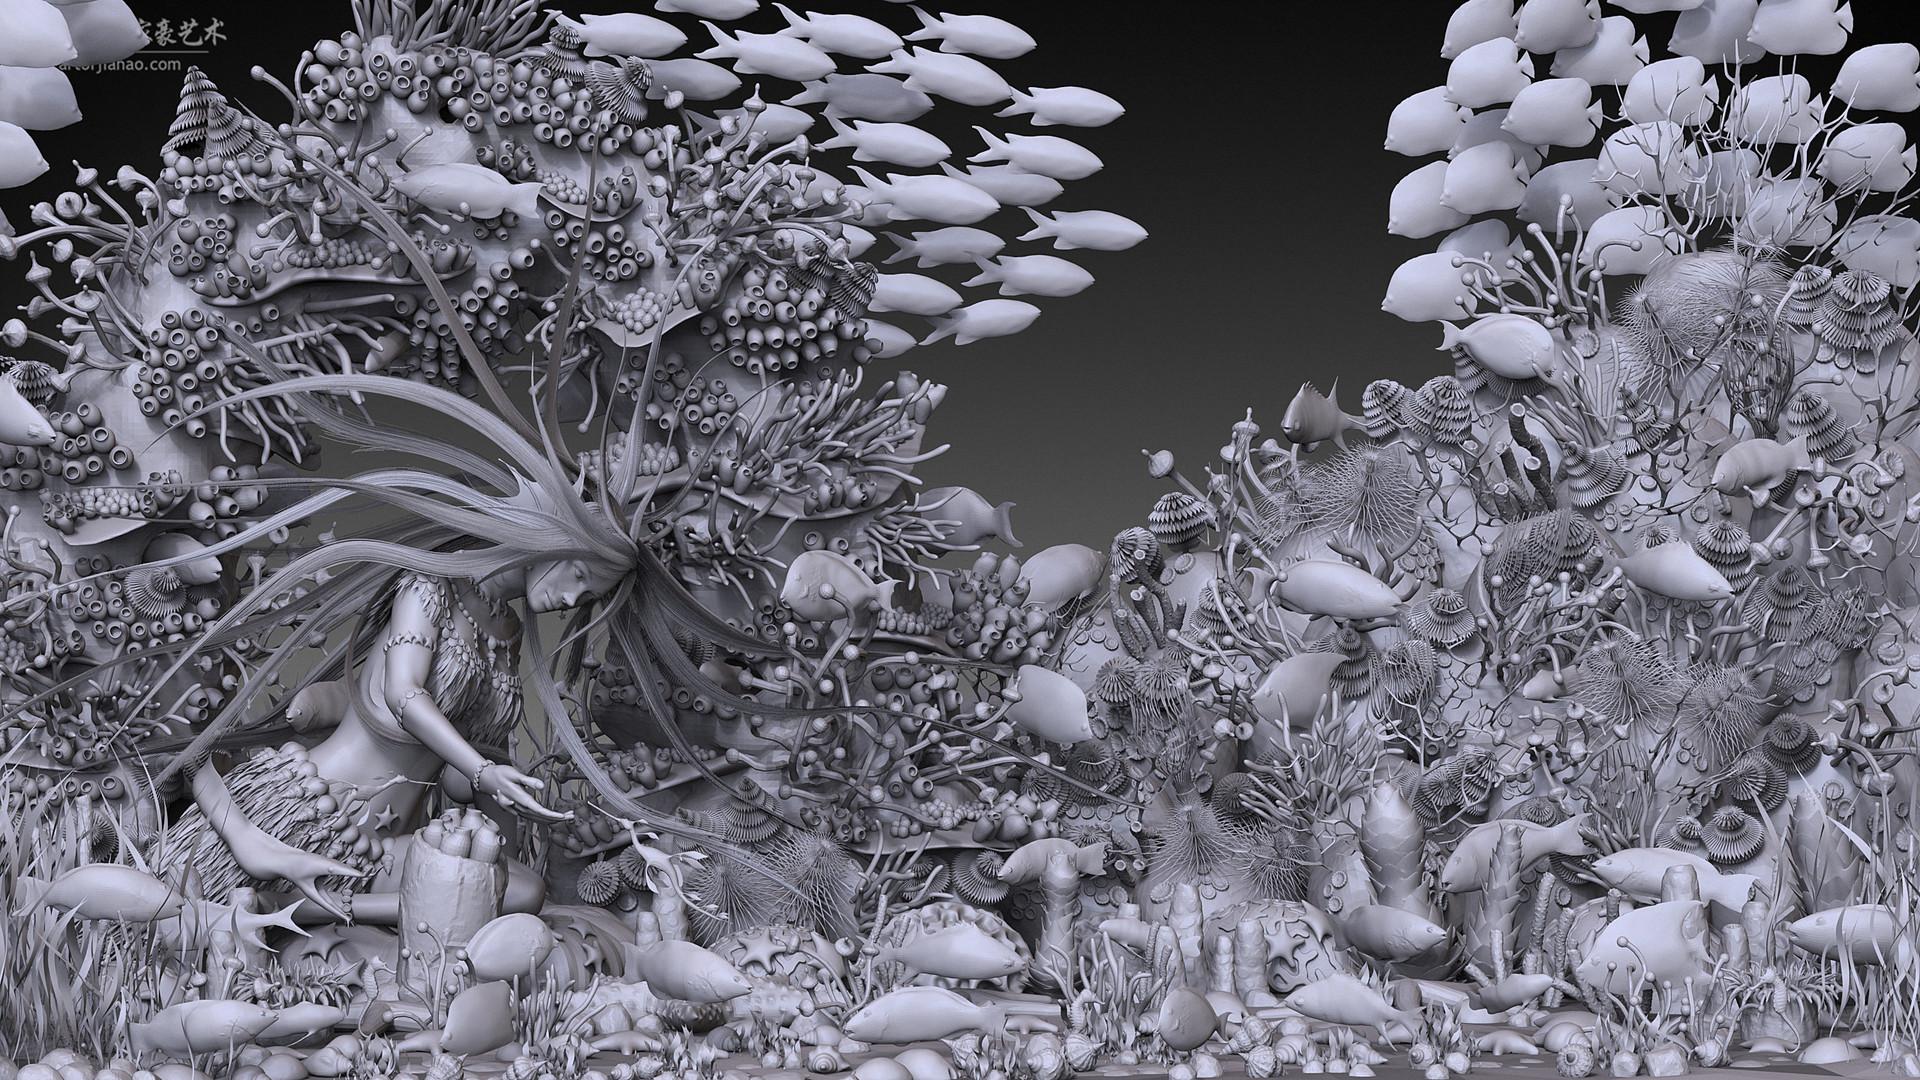 Jia hao coraline 01